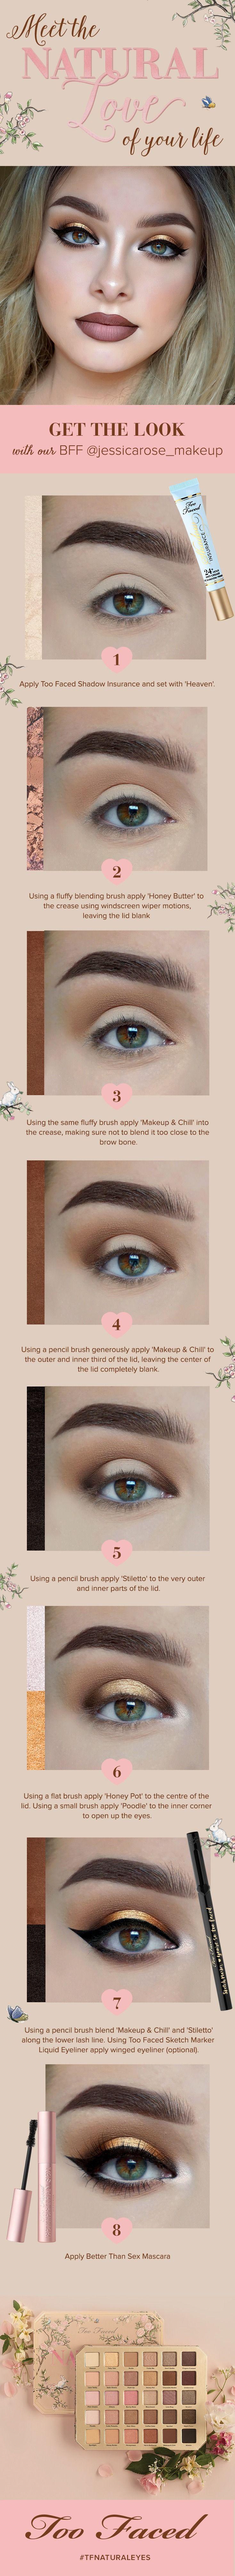 Свадьба - Too Faced Natural Love Eyeshadow Palette